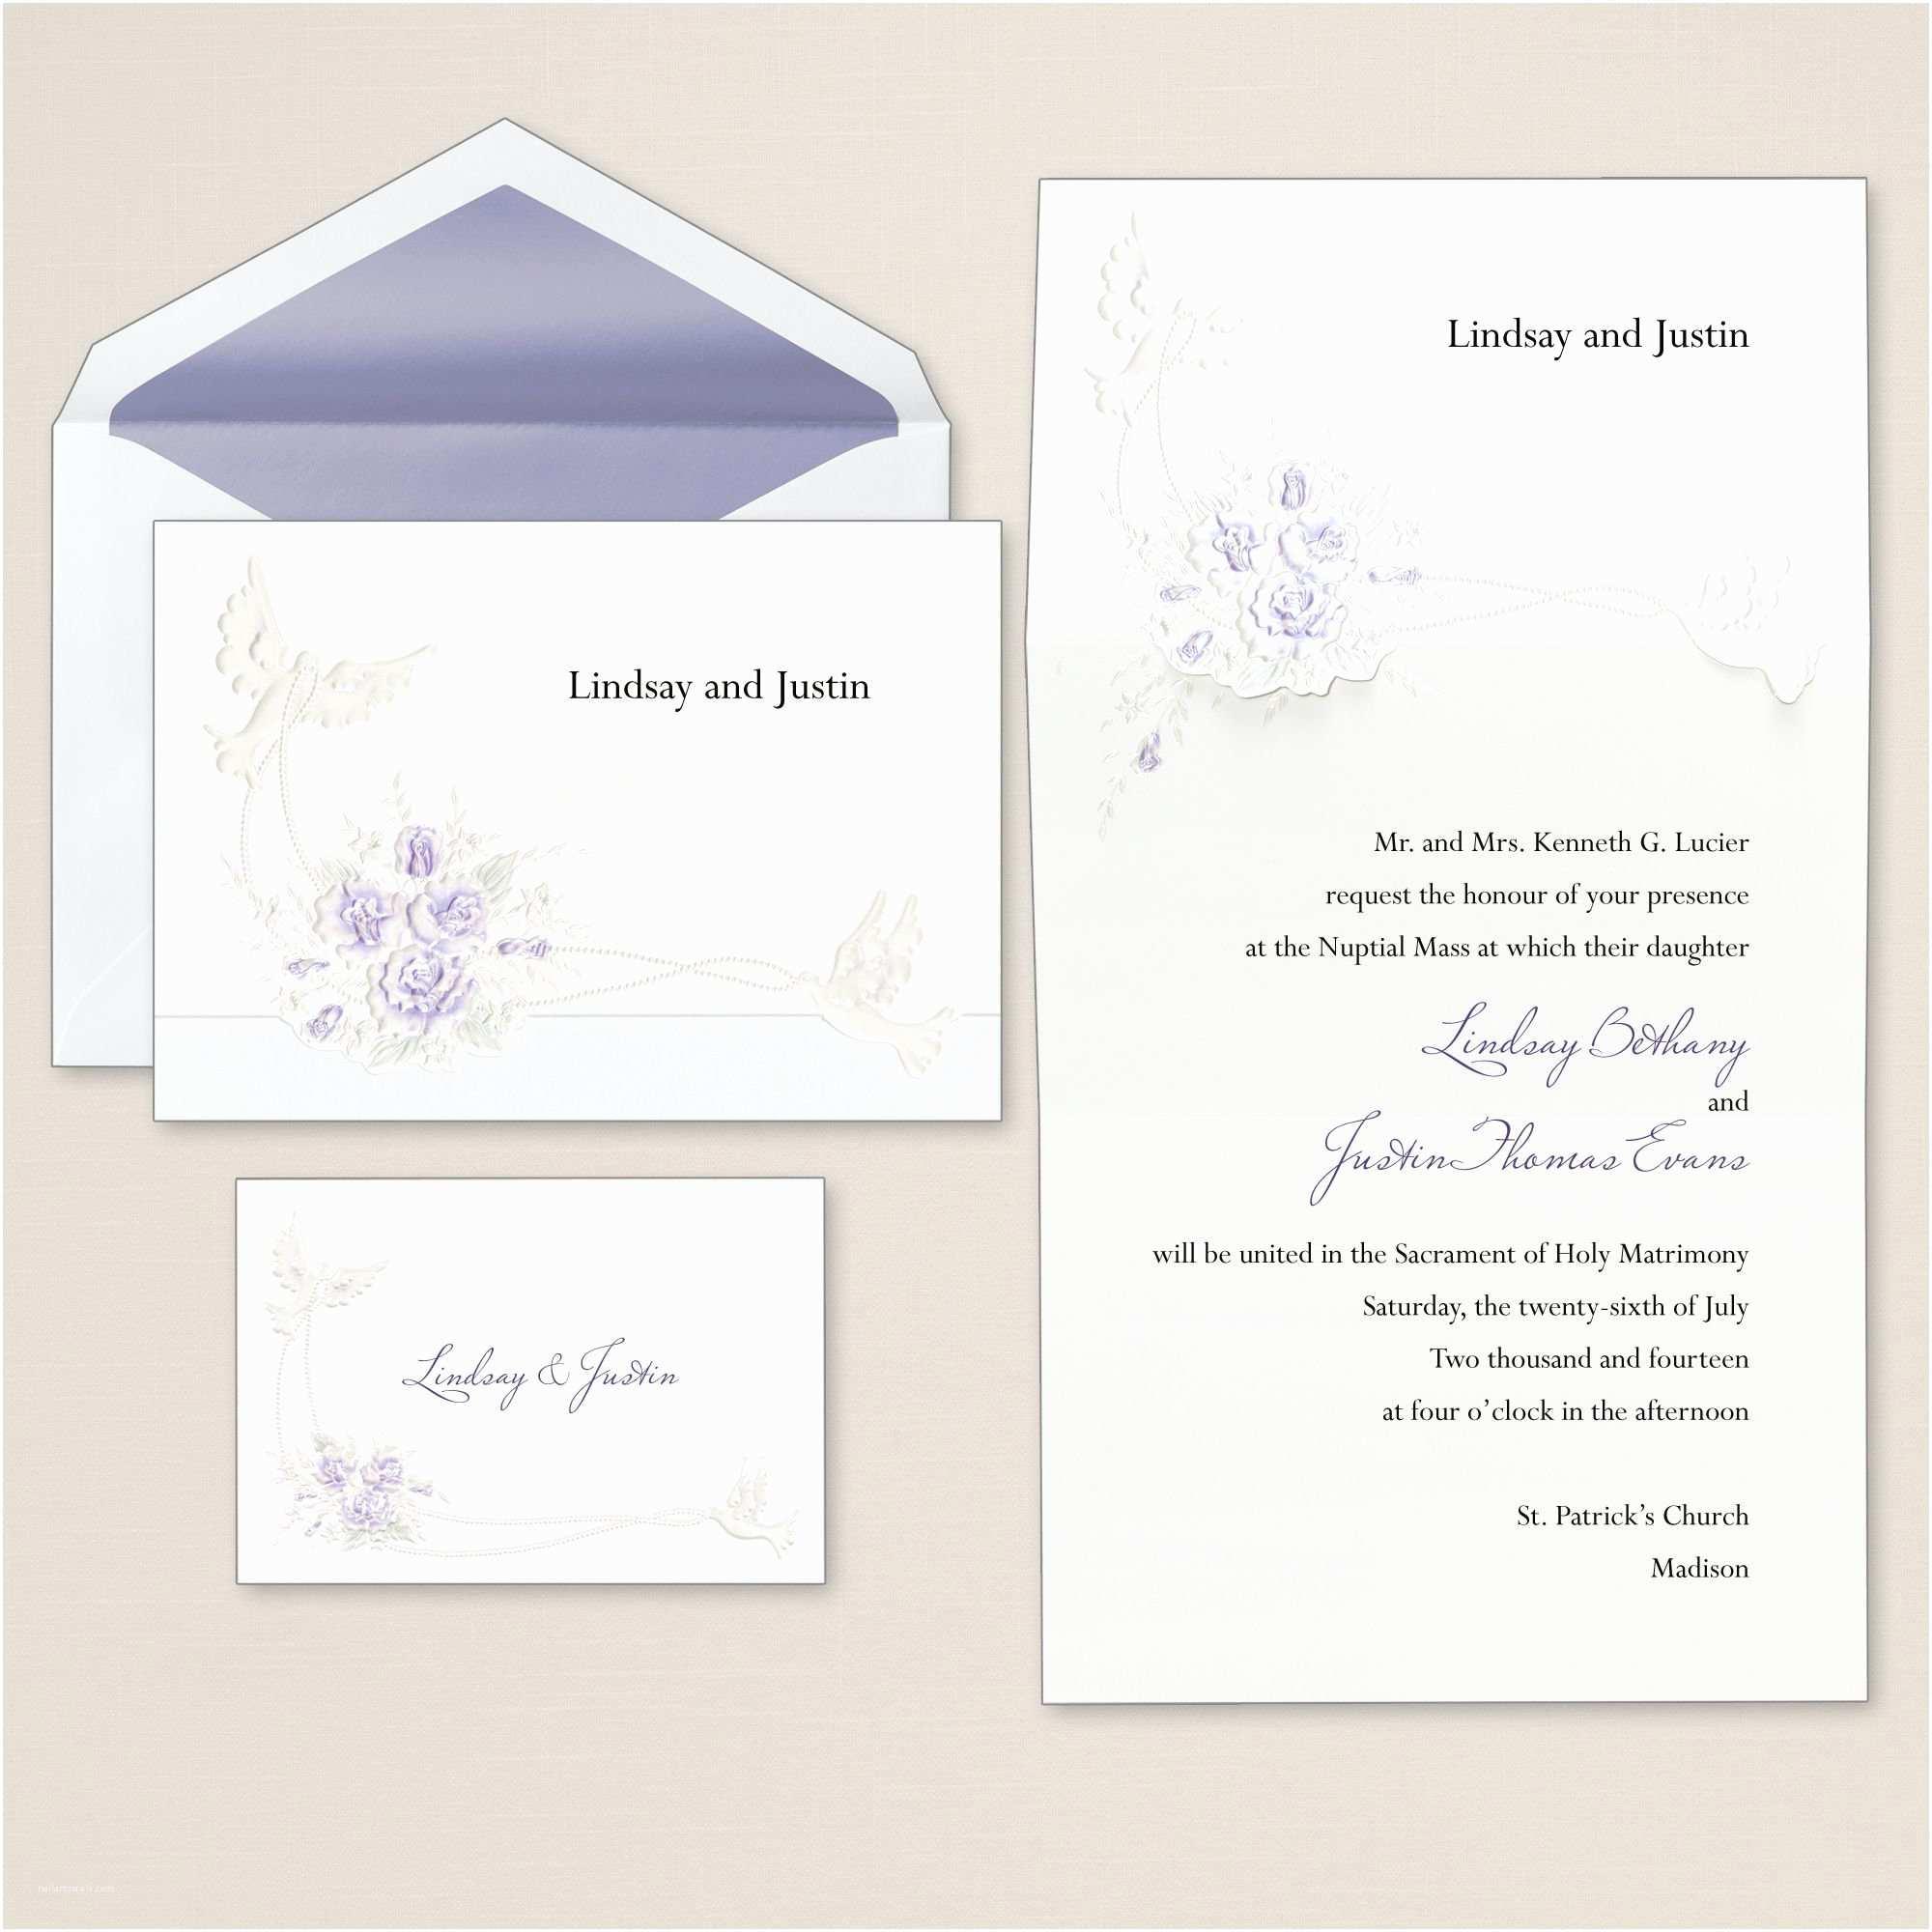 New Wedding Invitations Wedding Invitation Wedding Invitations Reply Cards New